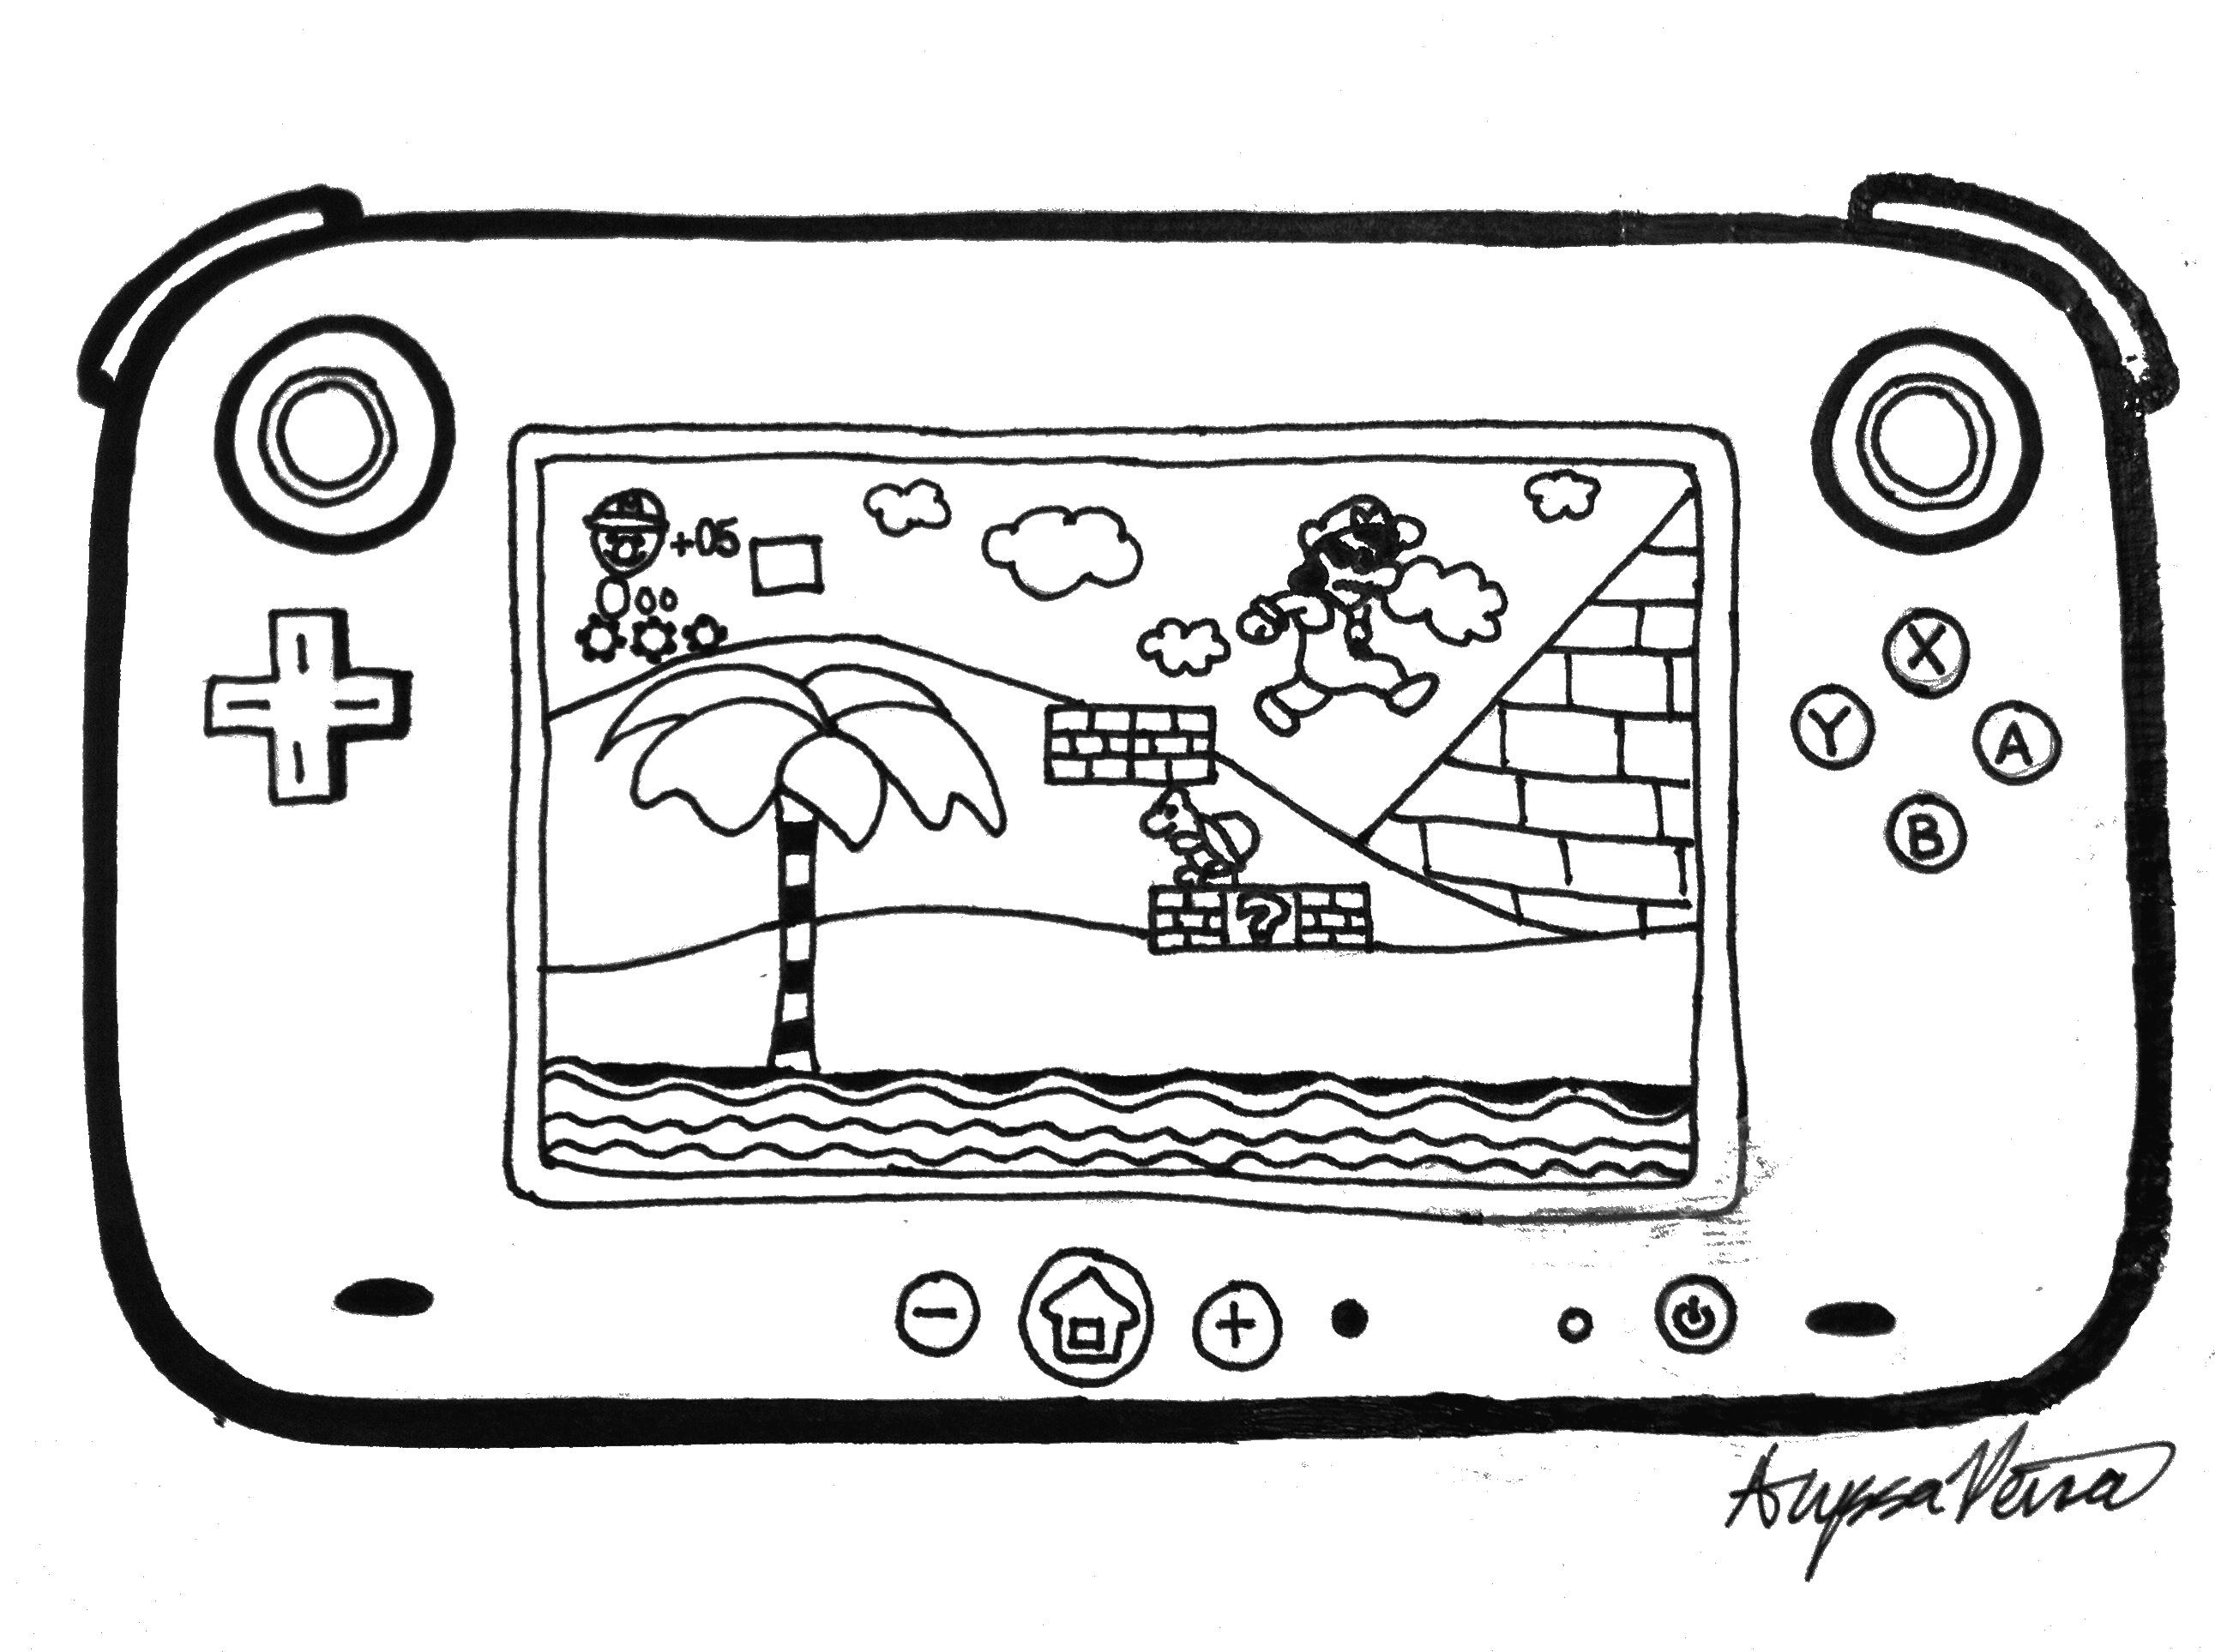 Wii U By Nintendo